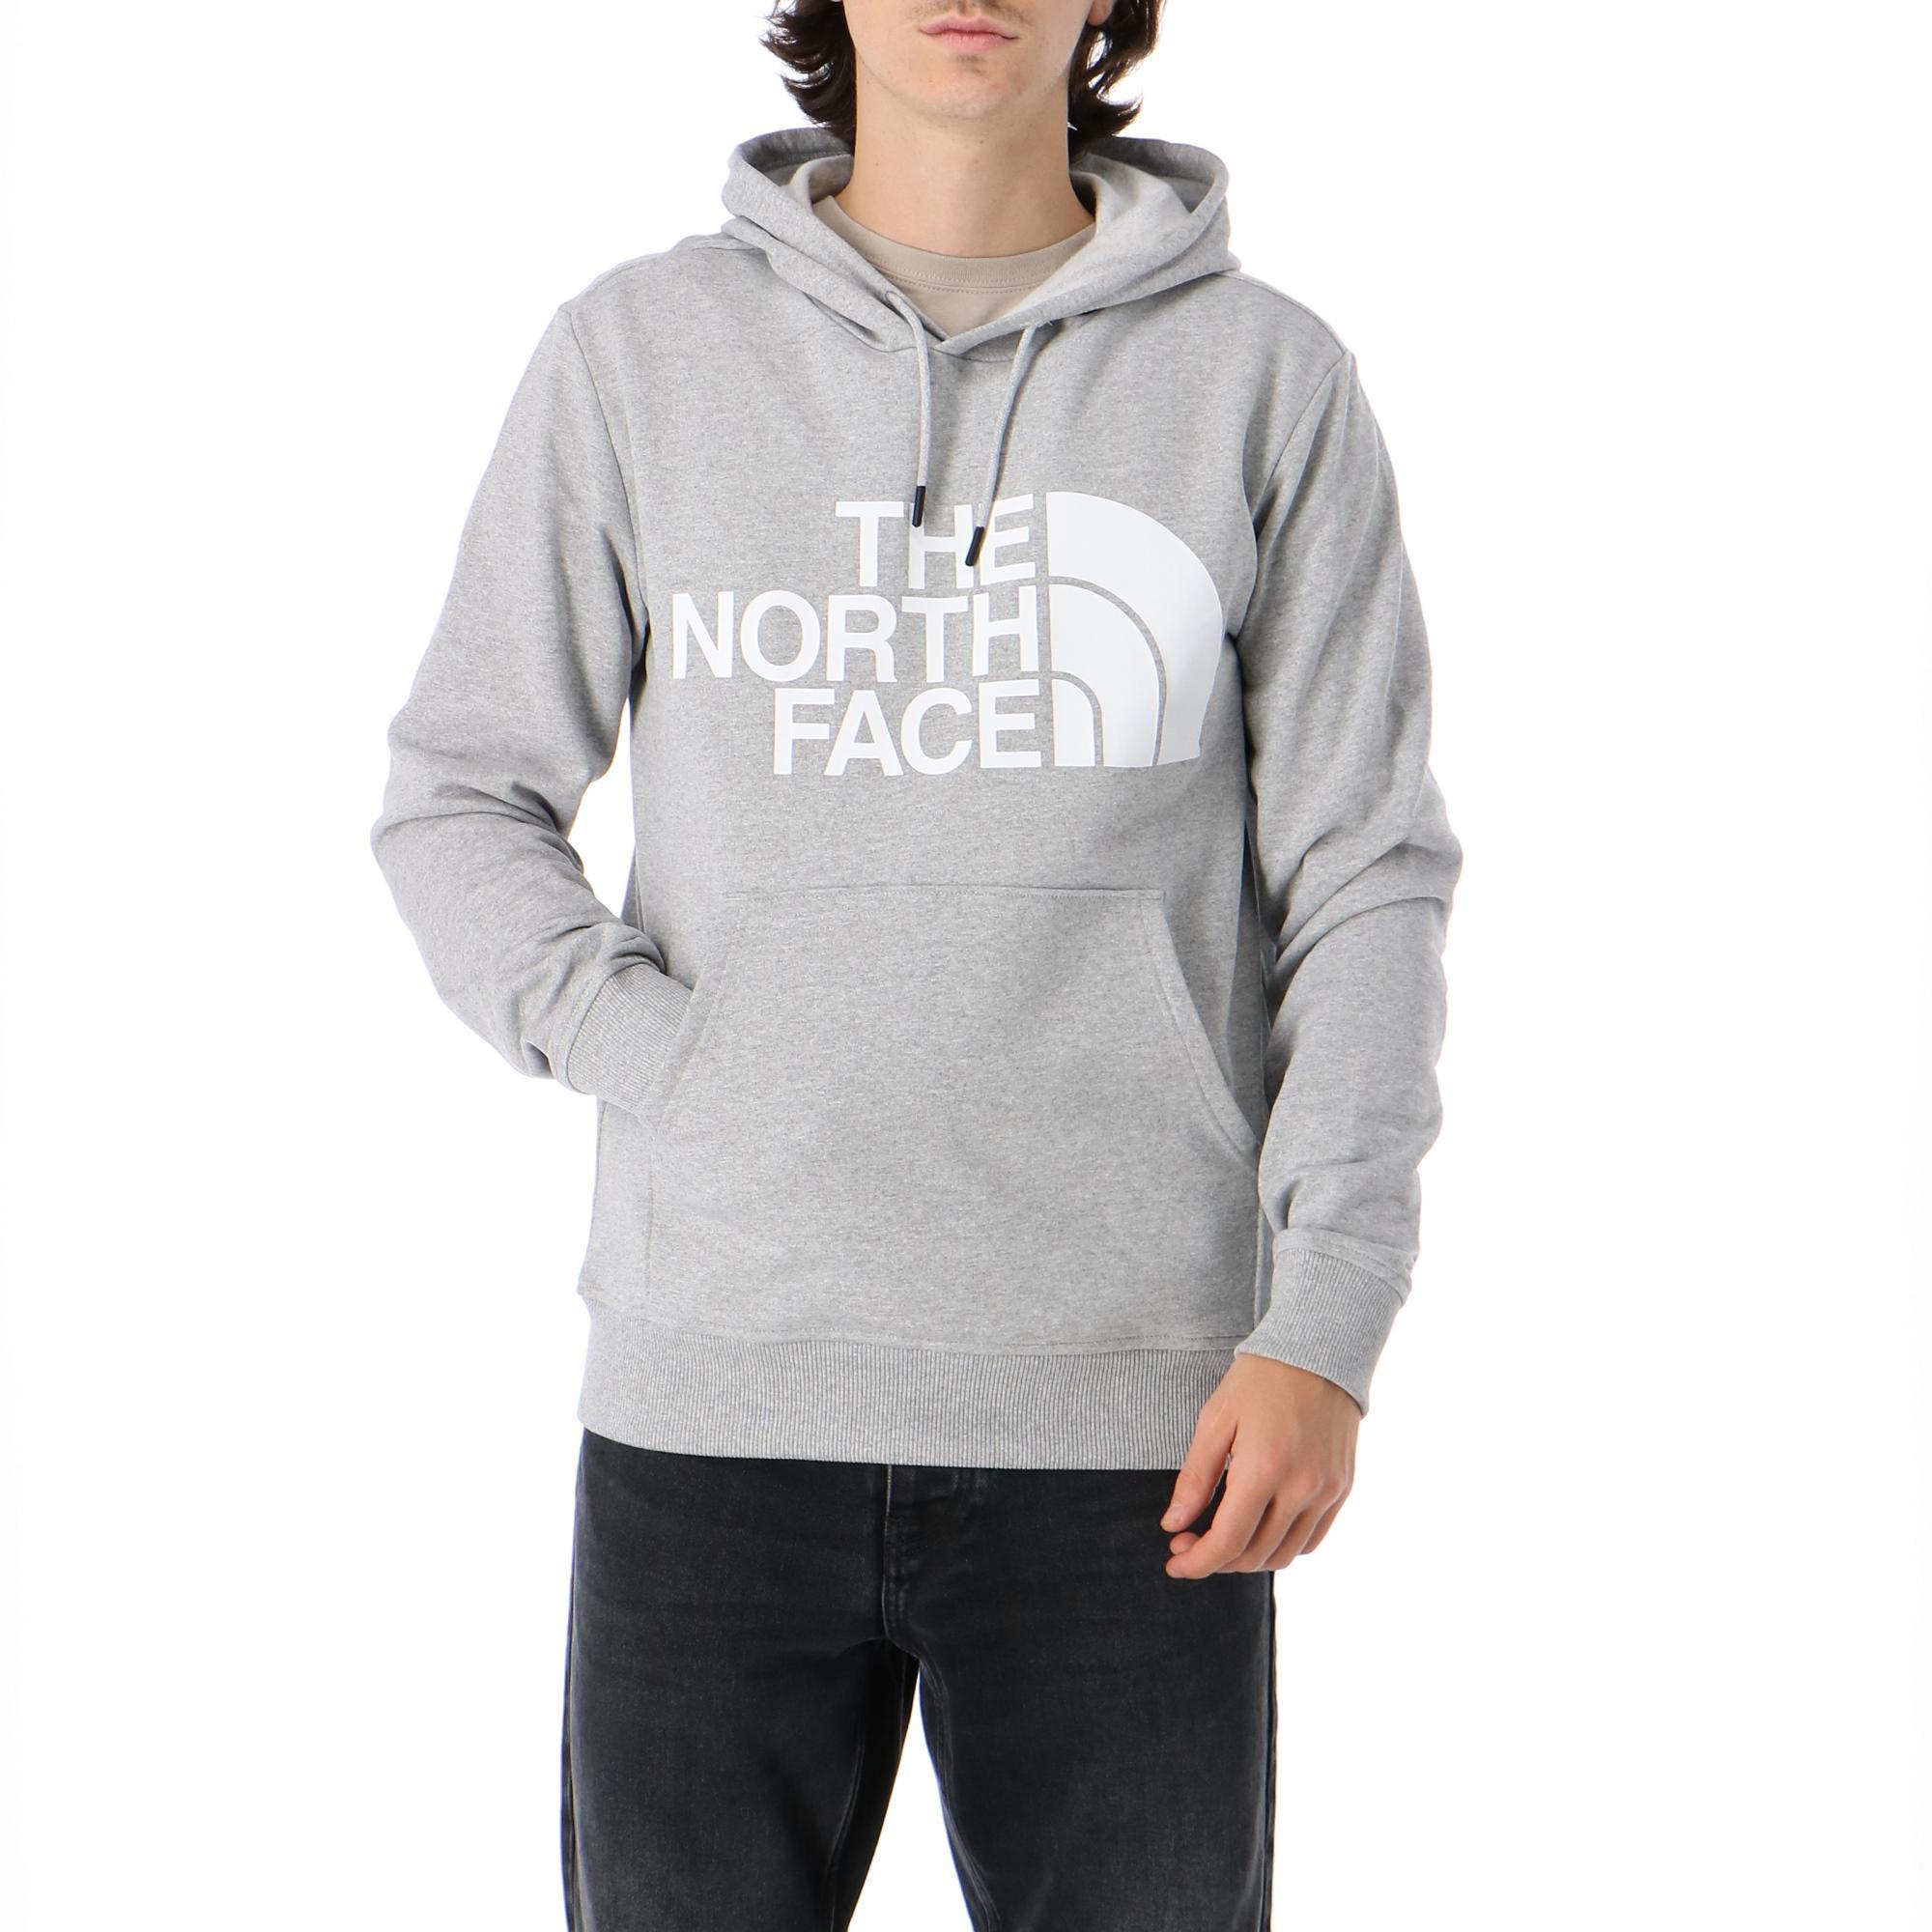 The North Face M Standard Hoodie Tnf Light Grey Heather Treesse